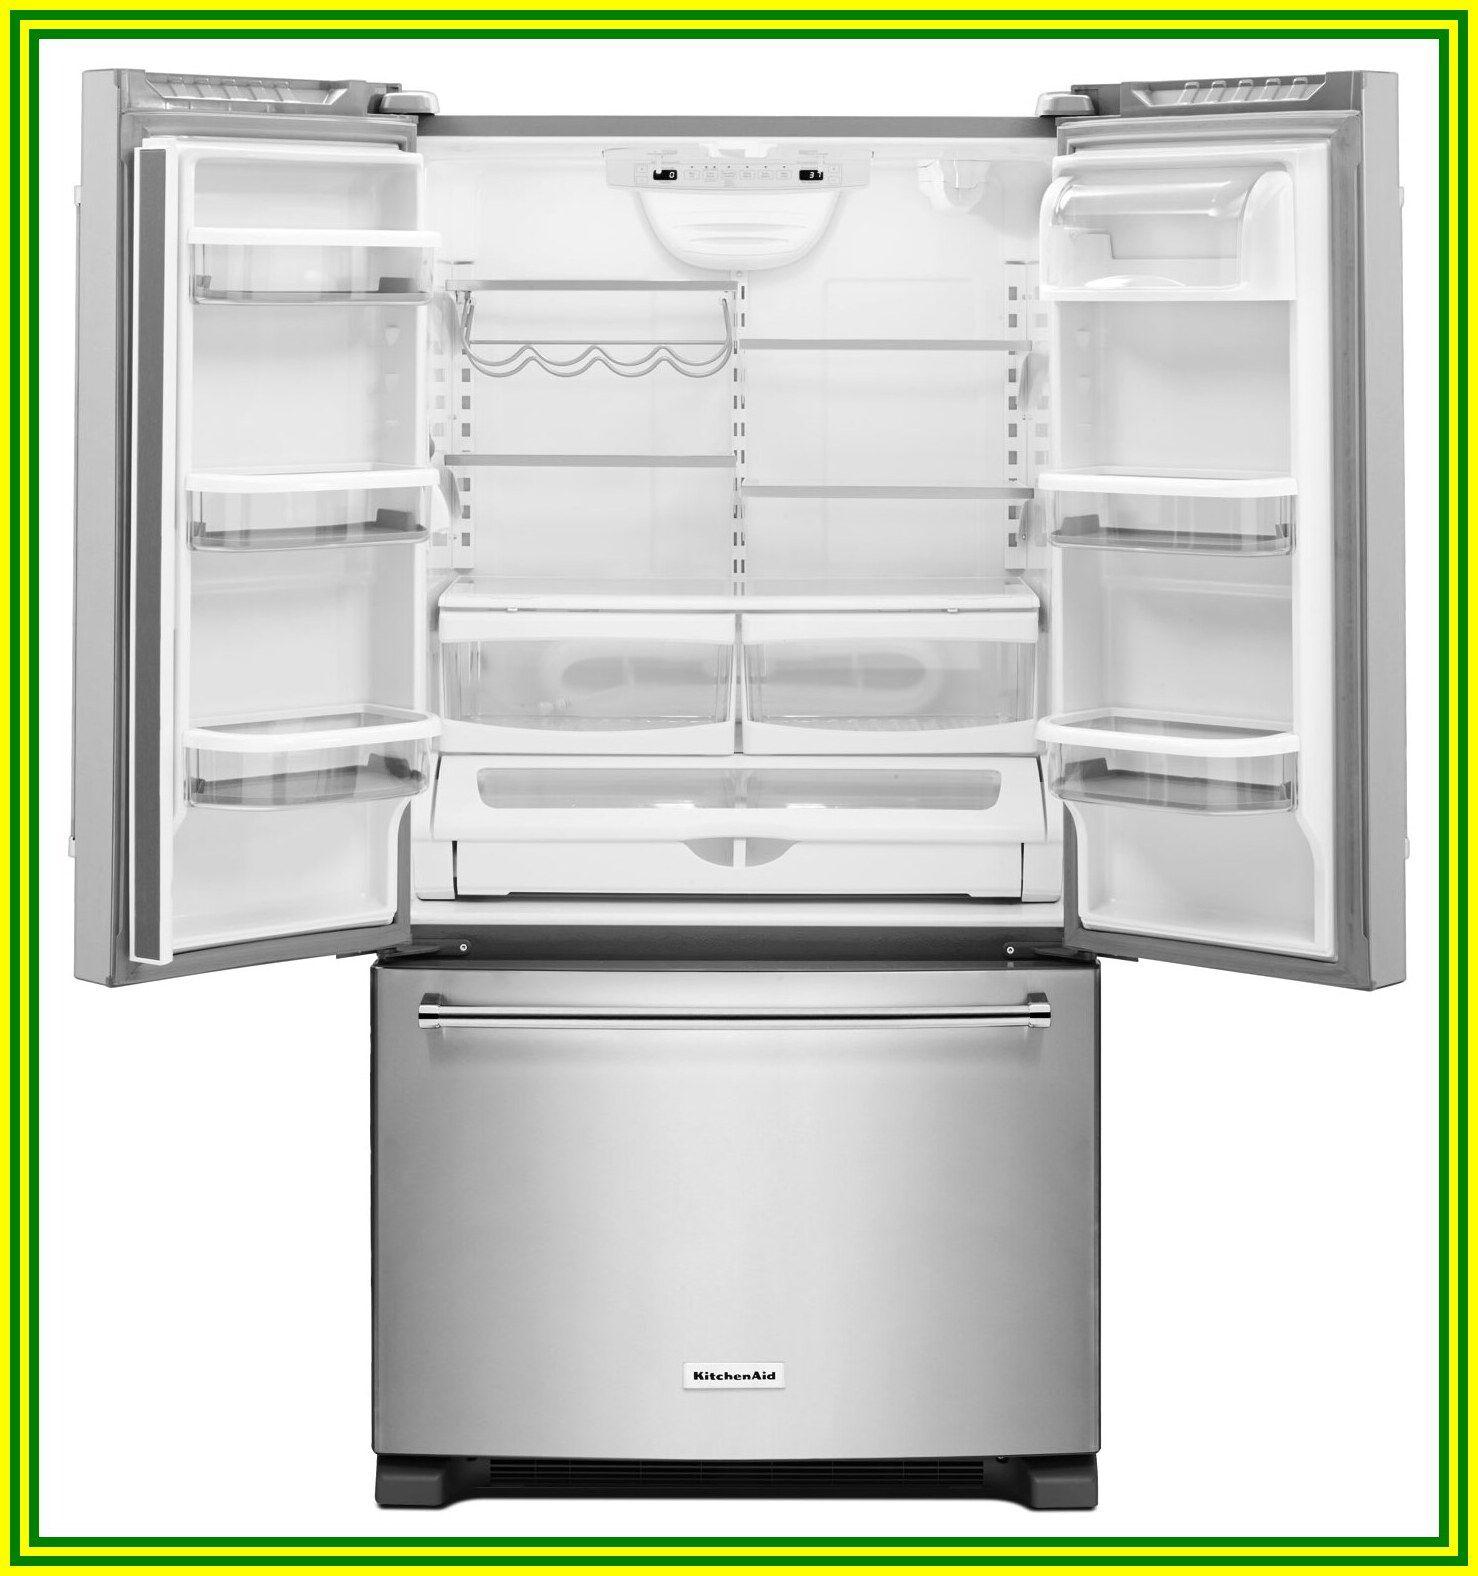 81 reference of kitchenaid fridge wood interior in 2020